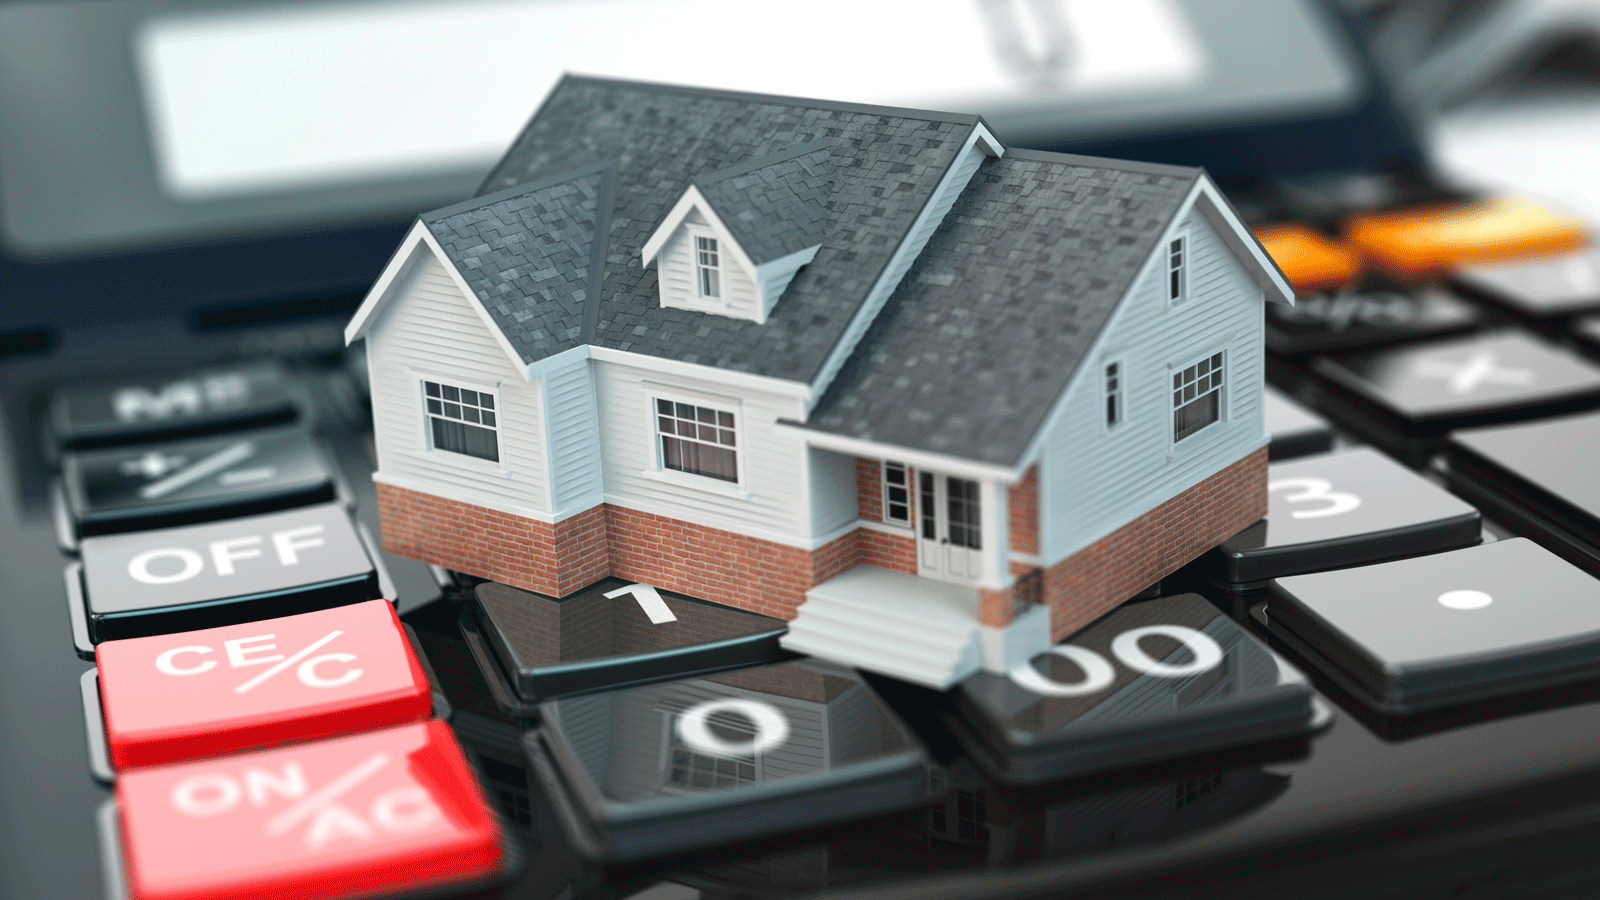 prestamos-hipotecarios-que-son-como-se-aplican-2